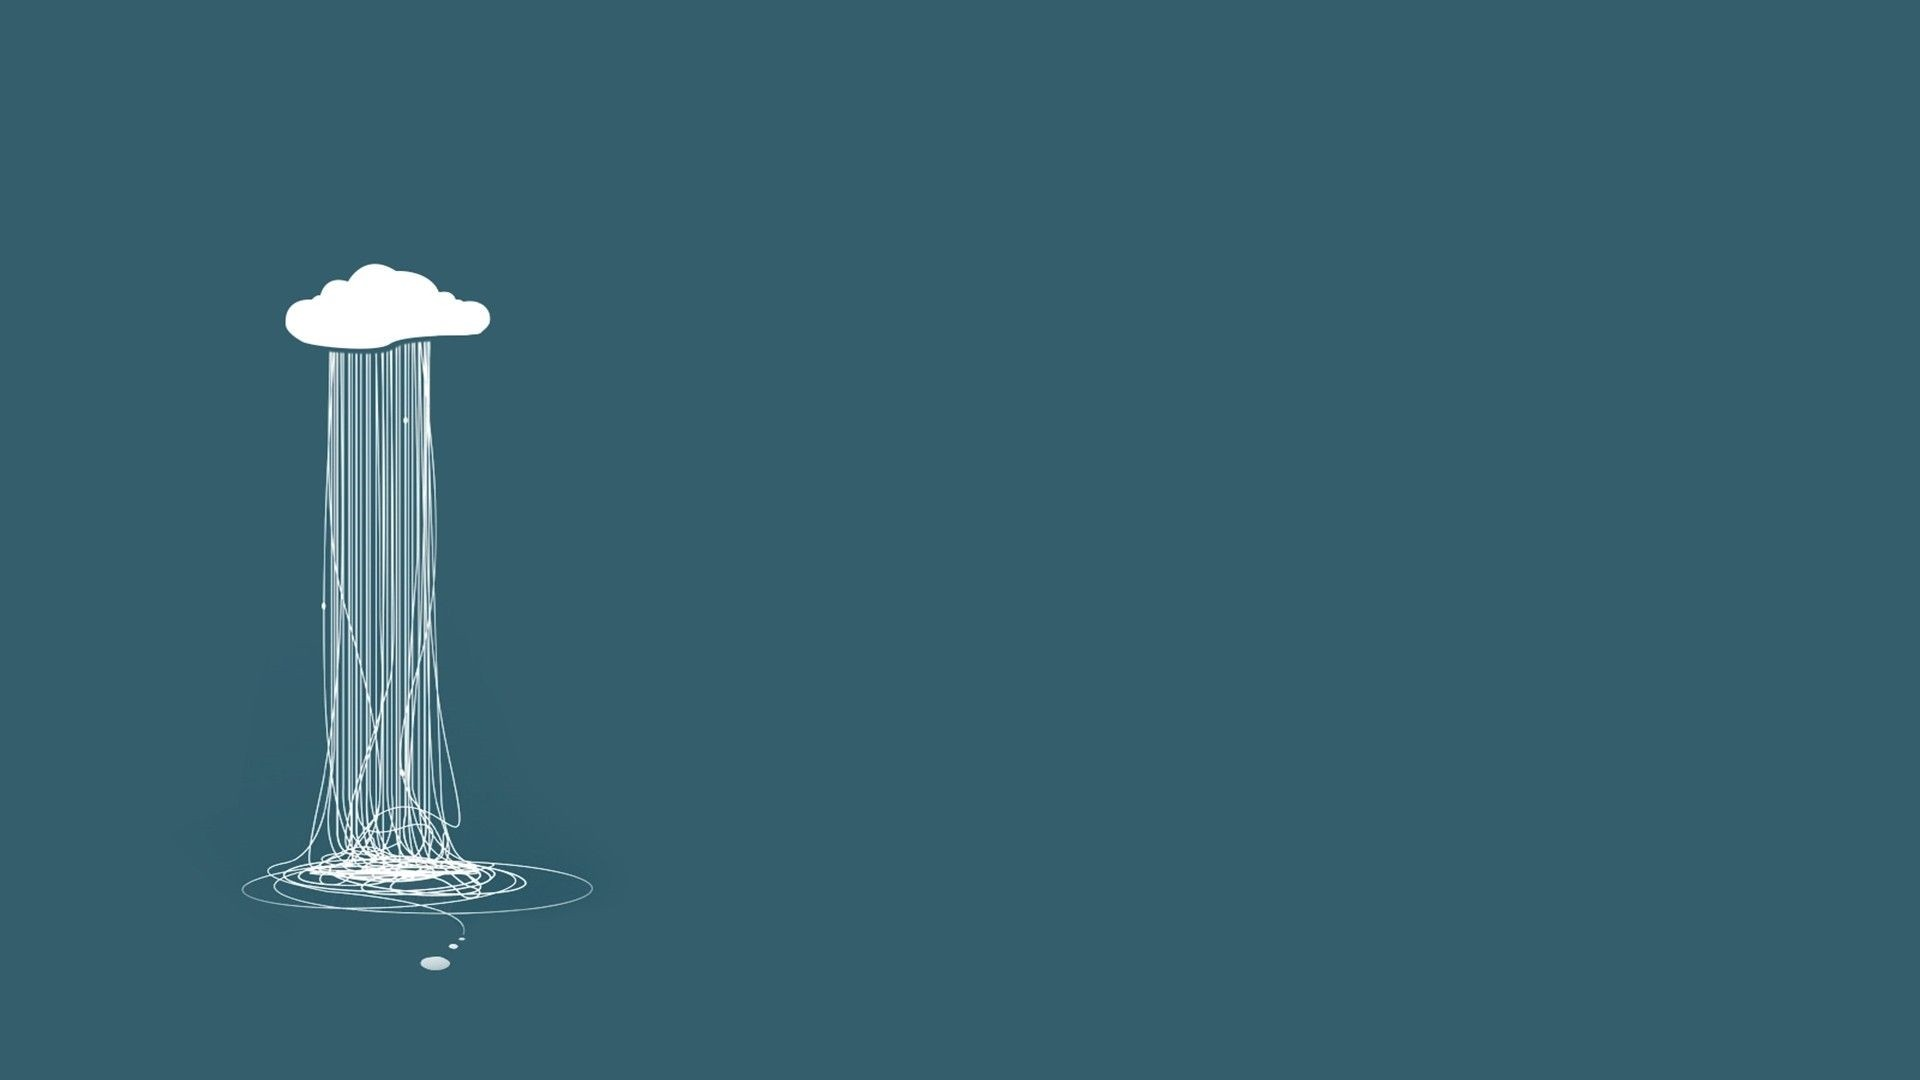 Rain Minimalist wallpaper for desktop